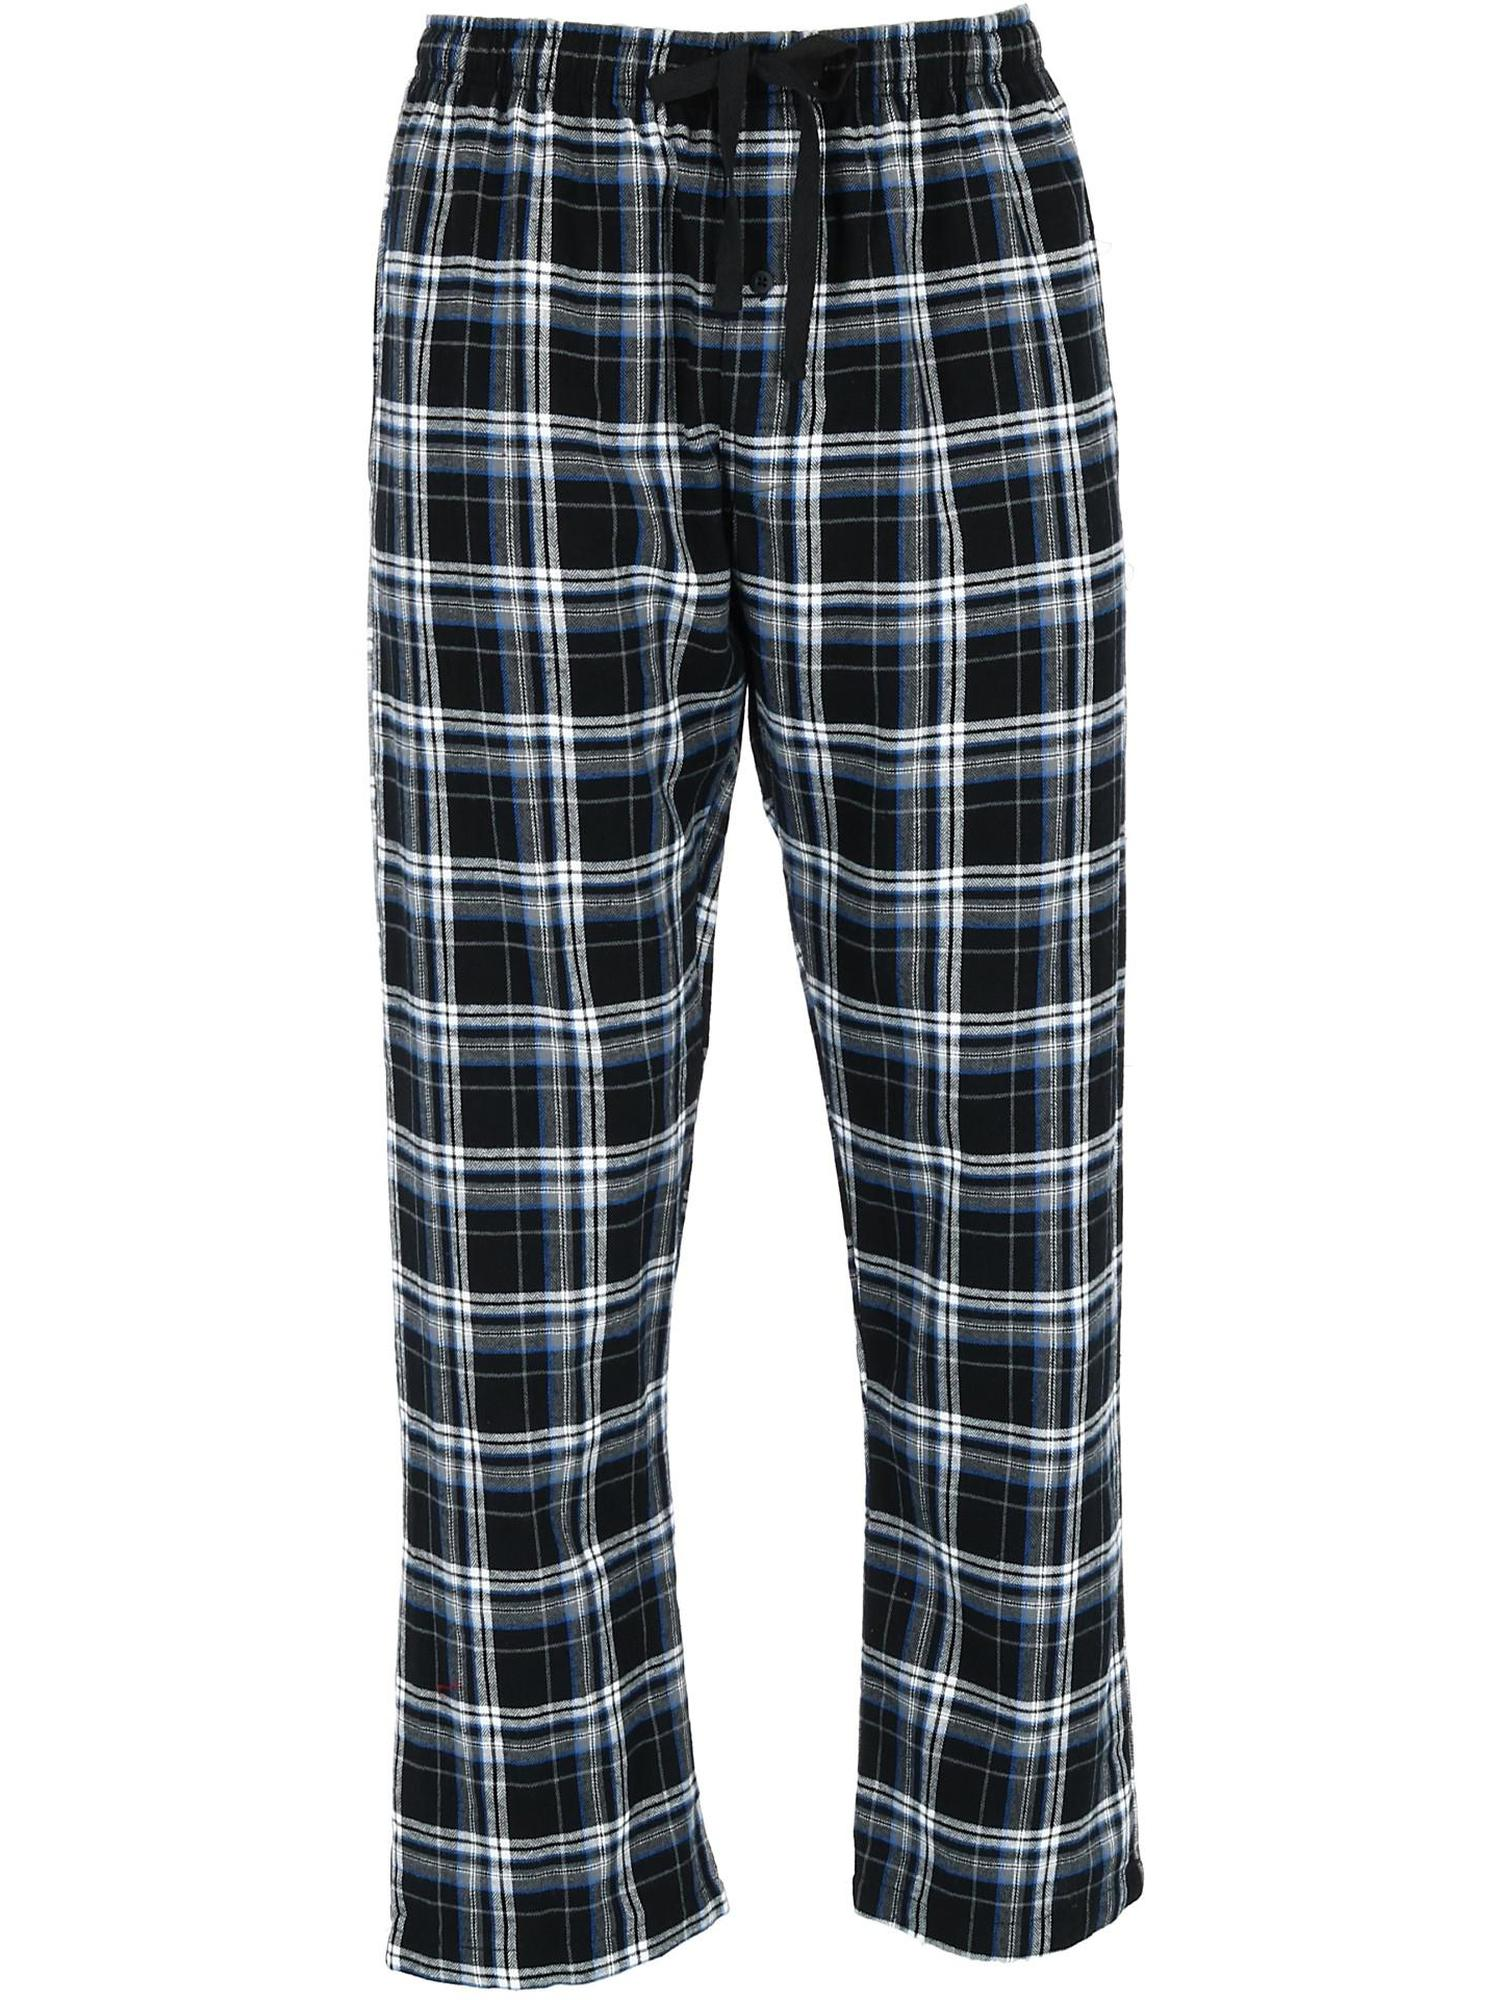 North 15 Girls/%100 Cotton Yarn-Dyed Plaid Soft Flannel Pajama Pants